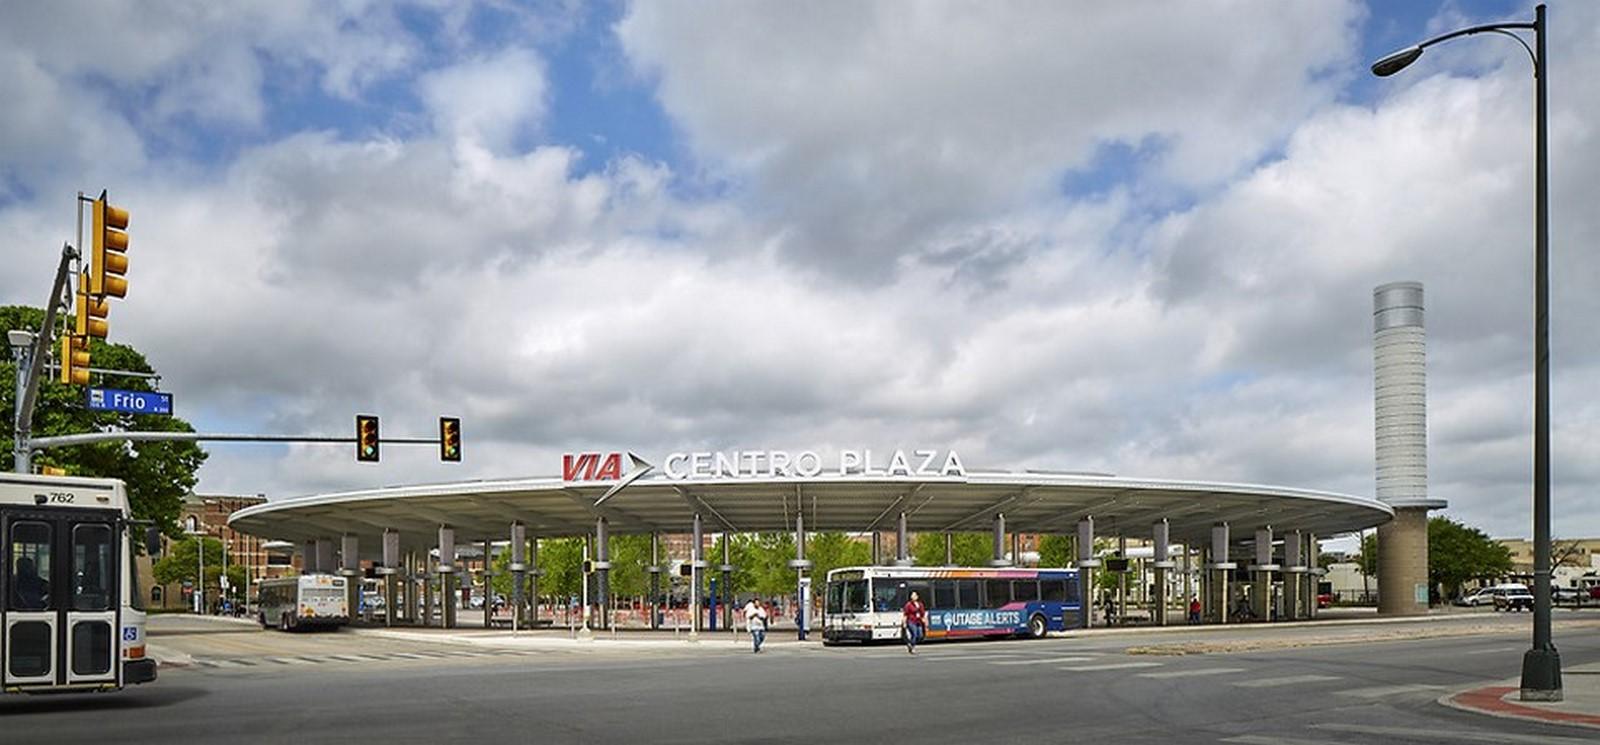 VIA Centro Plaza - Sheet2